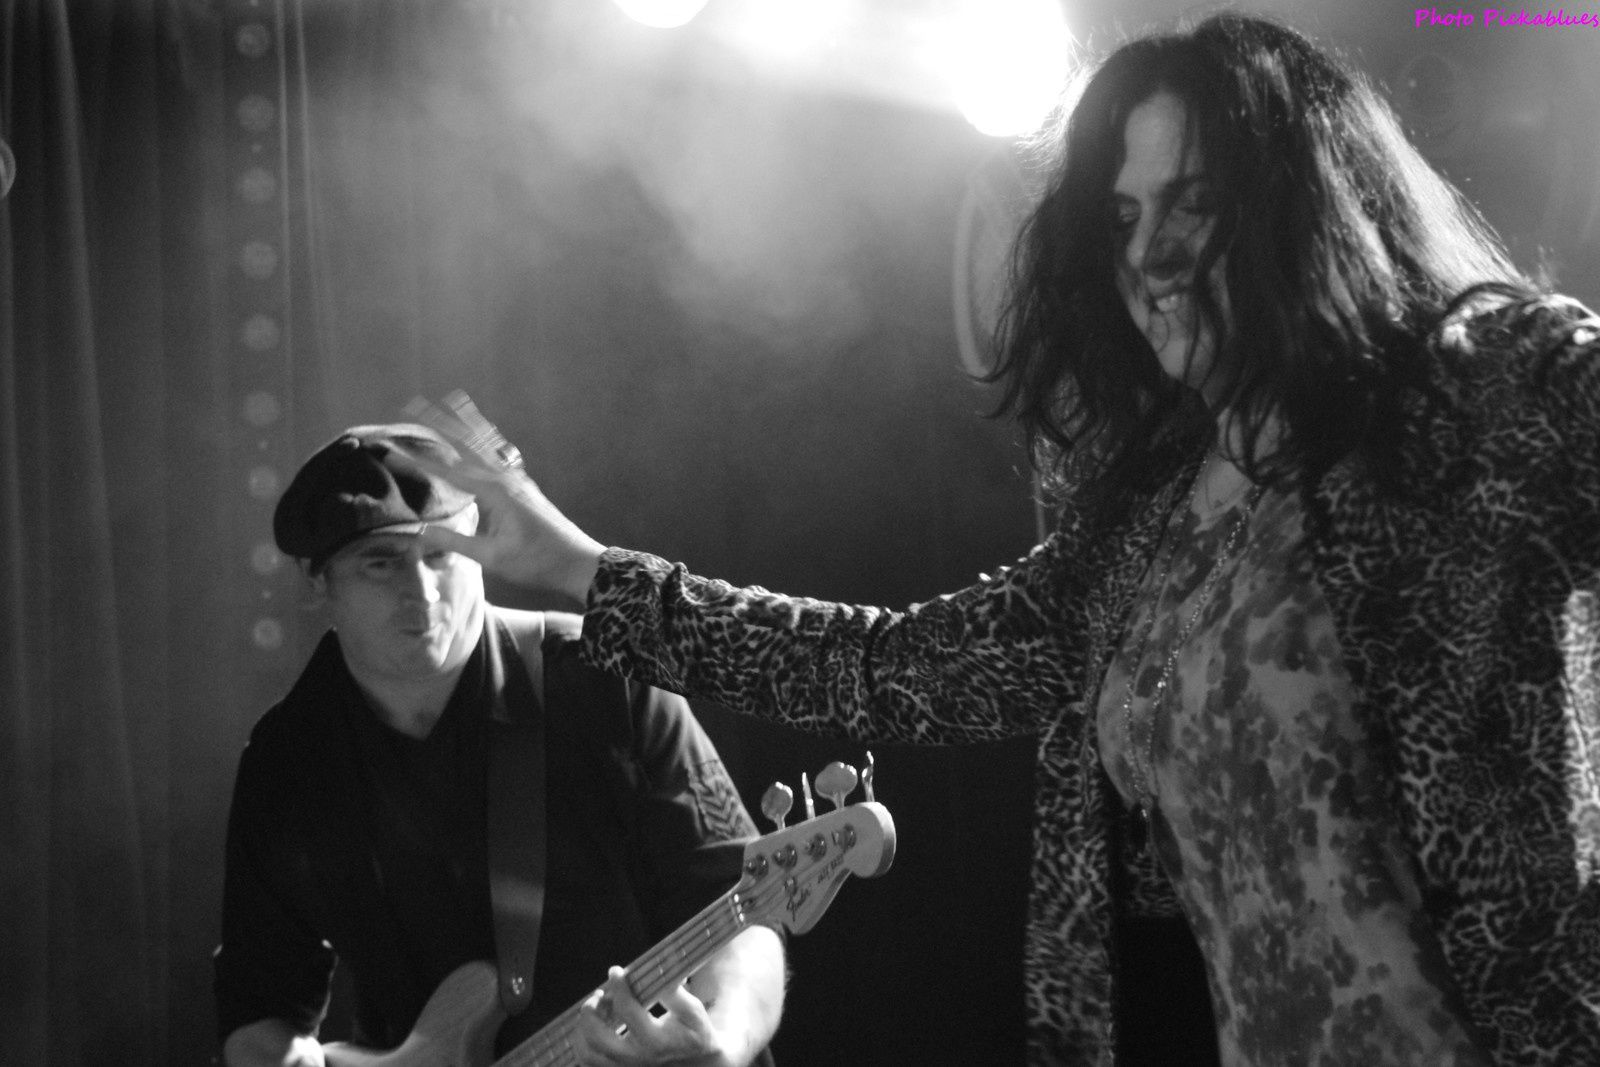 Sari Schorr - 23/03/2018 - La Boite à Musiques, Wattrelos (59)